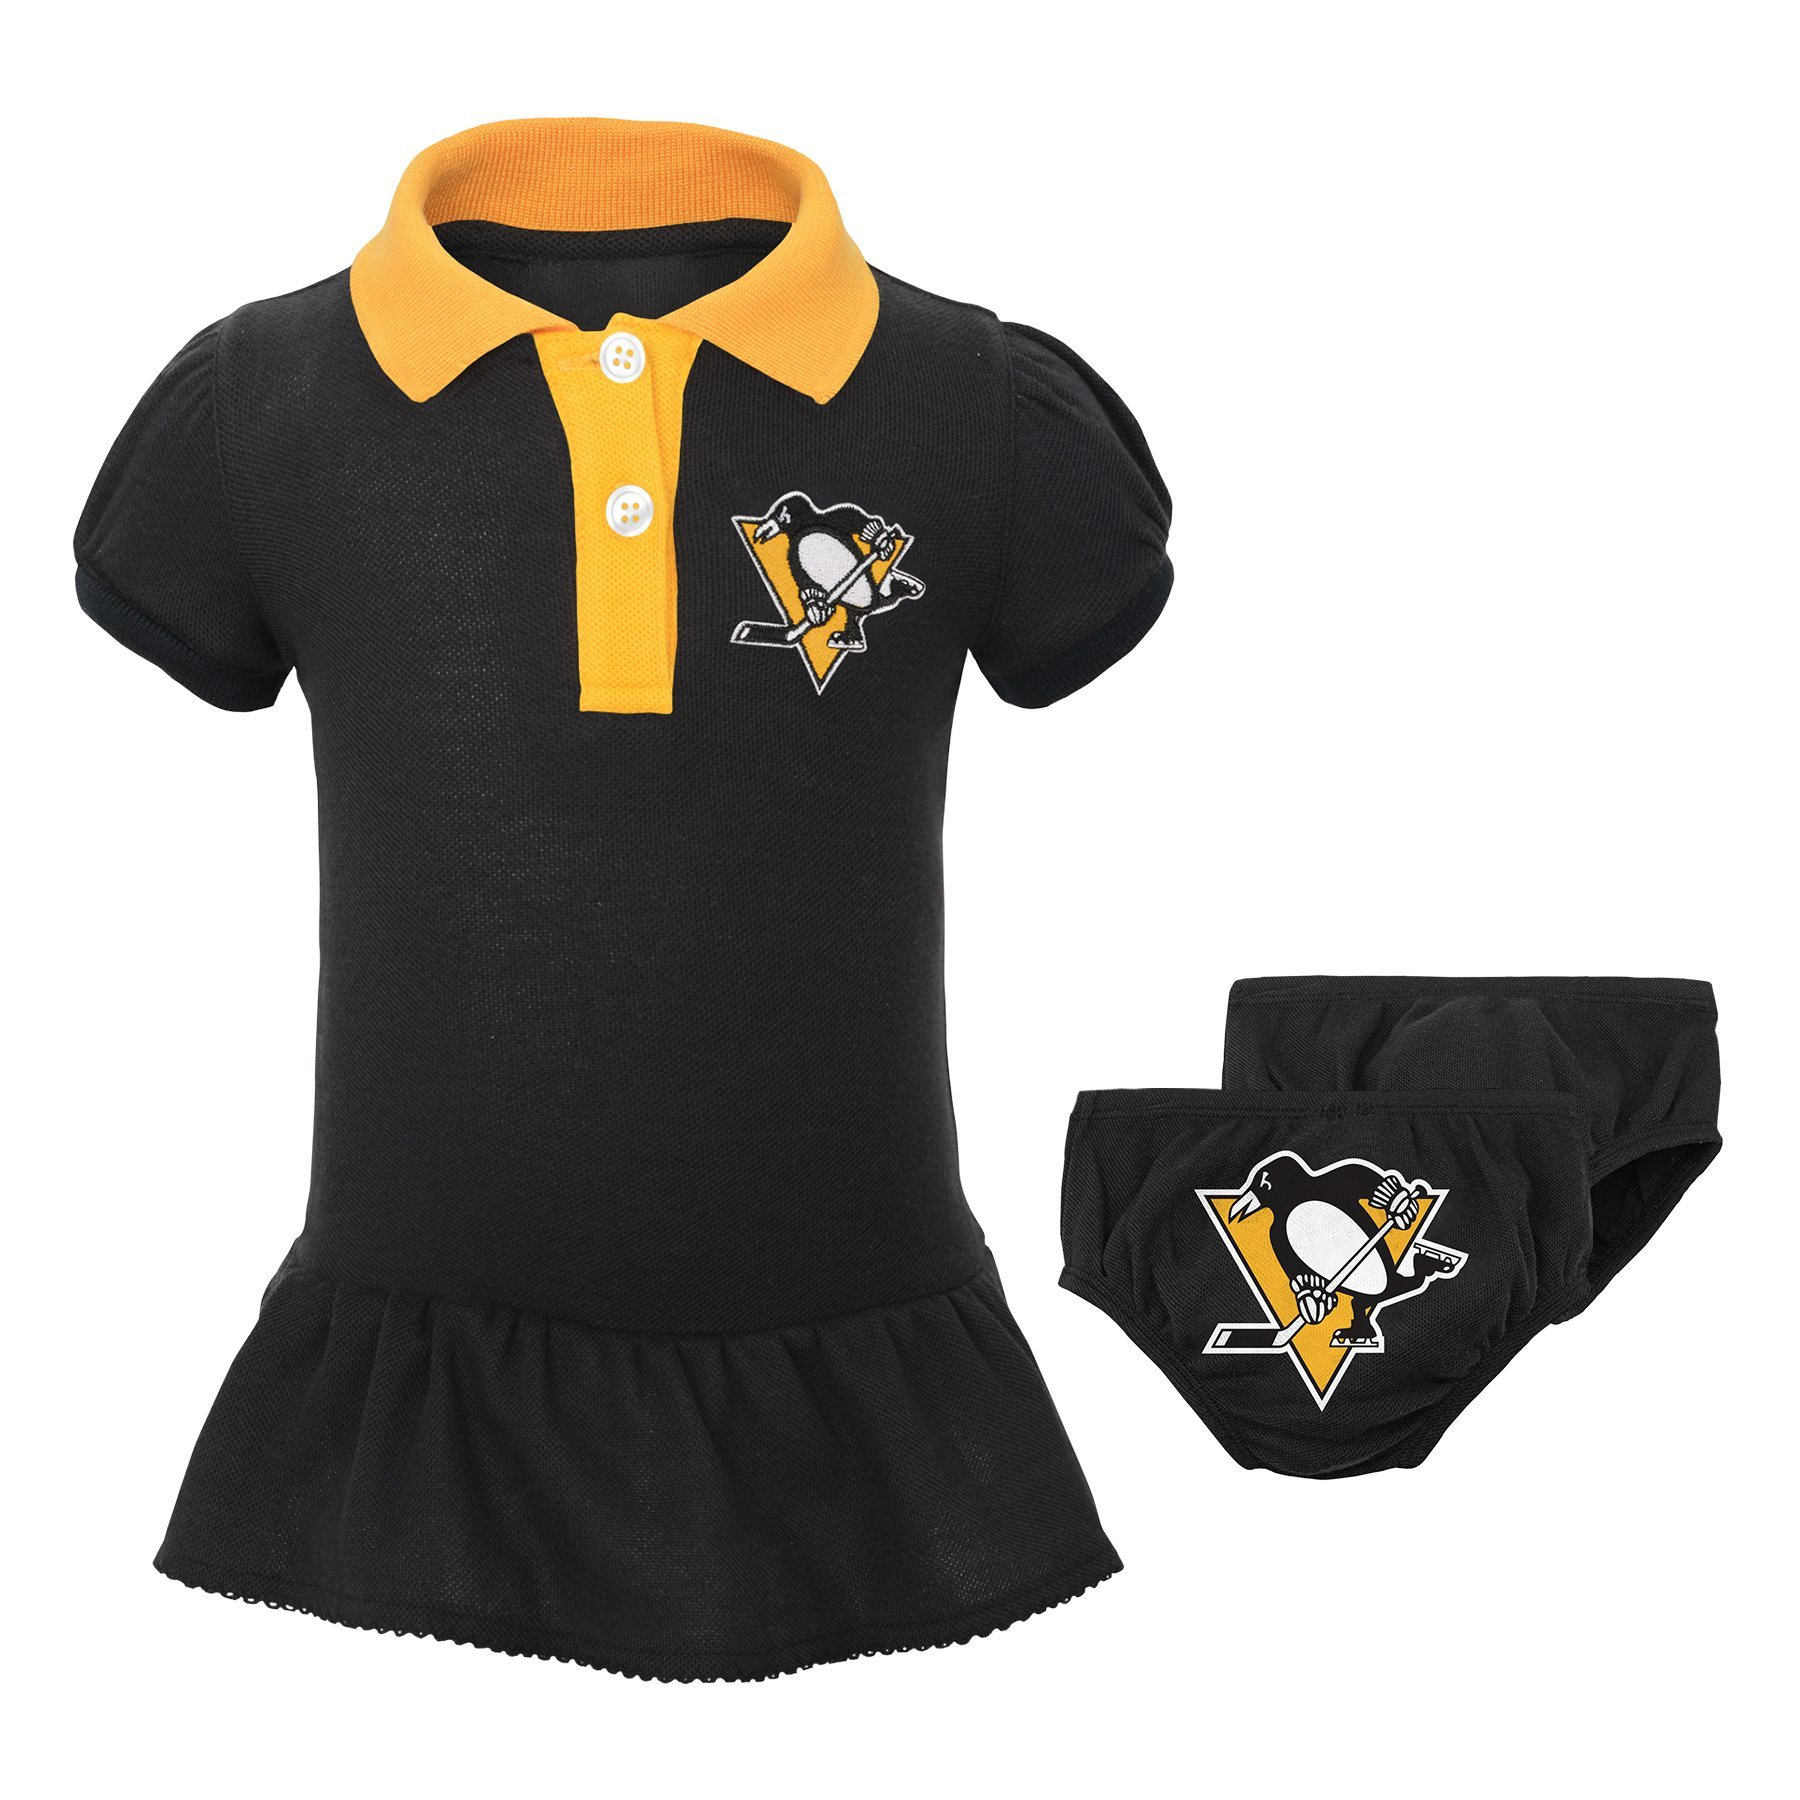 NHL Pittsburgh Penguins Newborn & Infant Little Prep Polo & Diaper Cover Set, 0-3 Months, Black